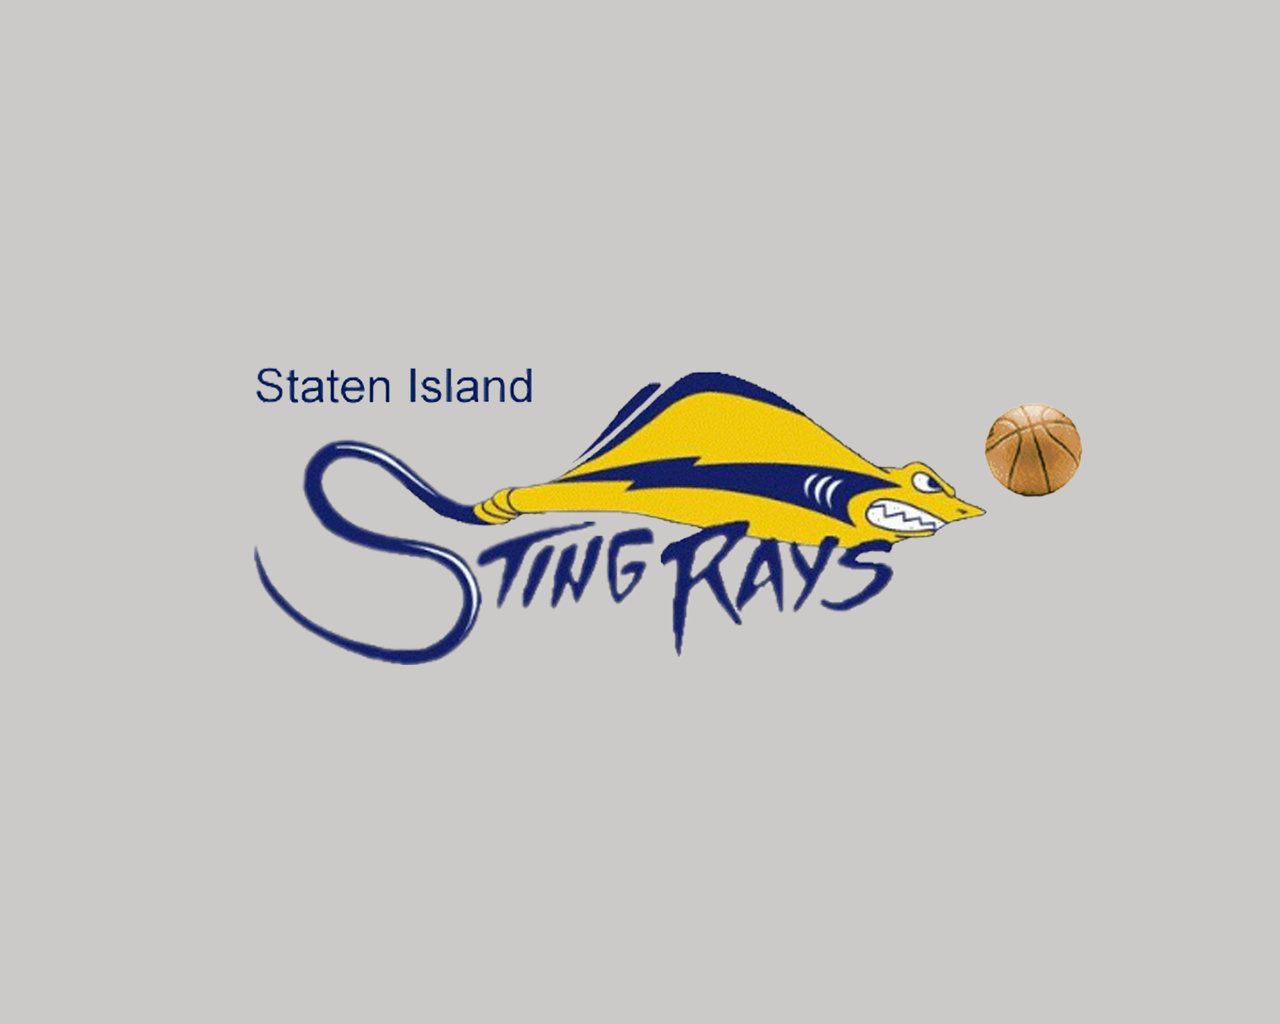 Staten Island Stingrays Facebook